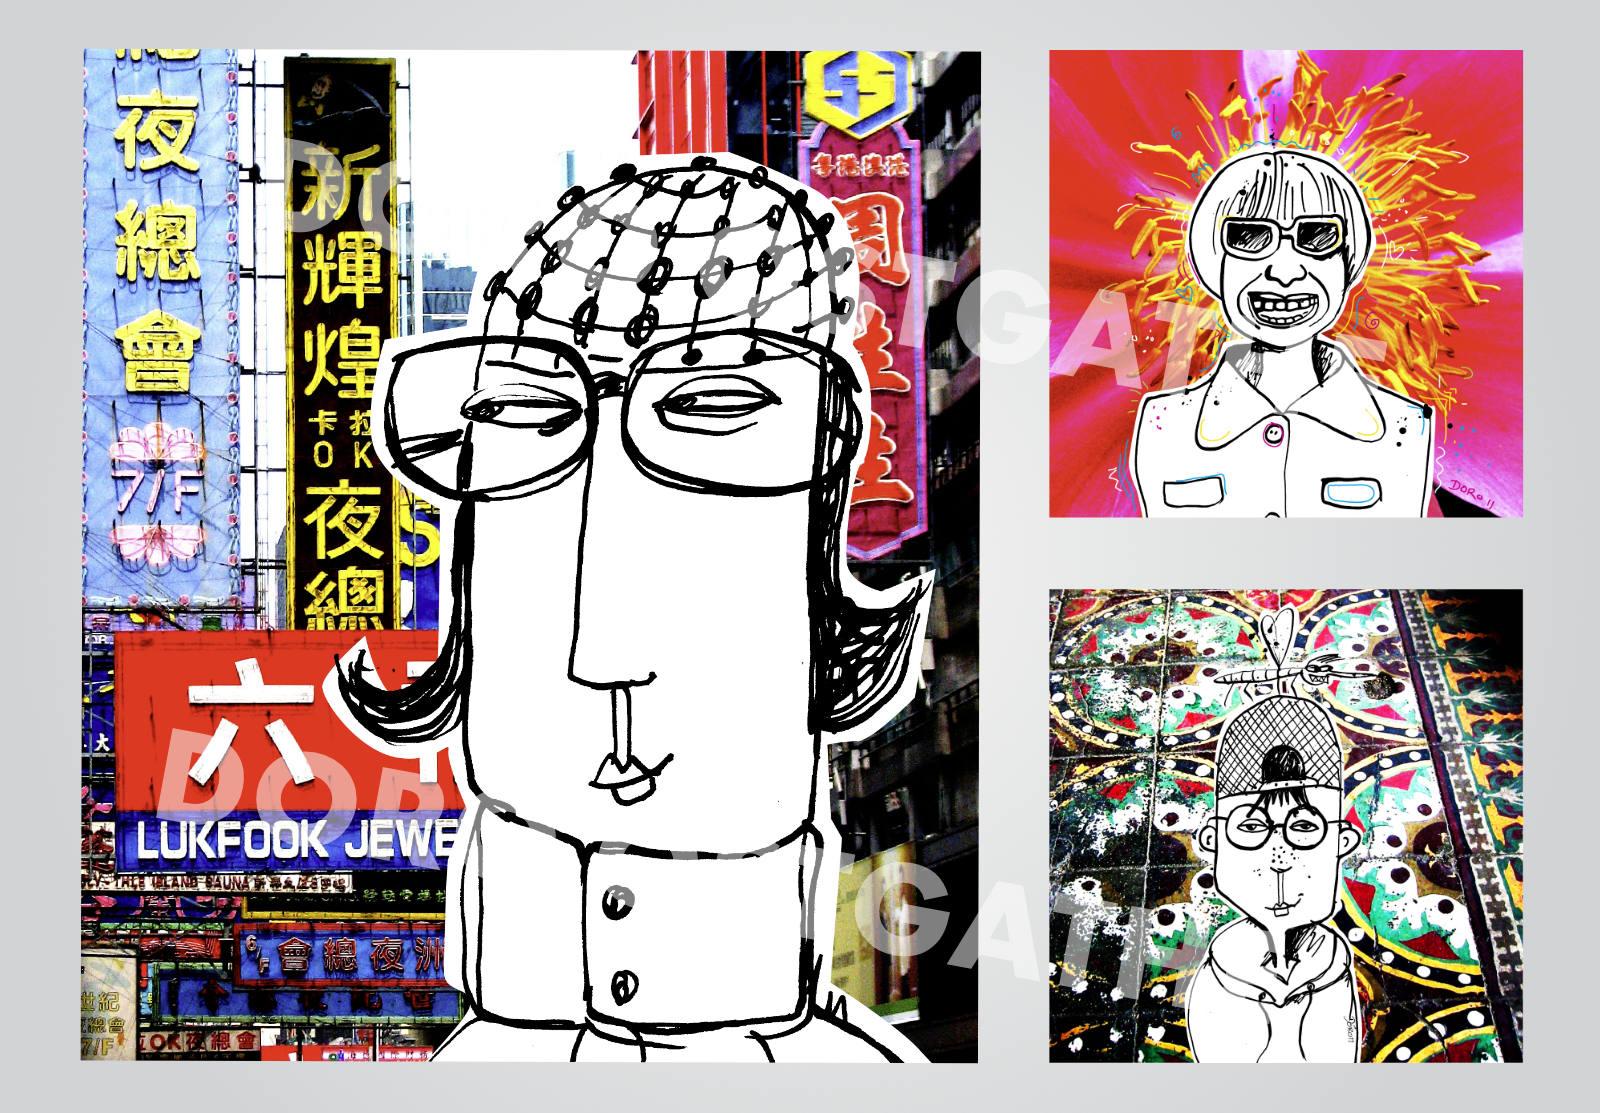 illustration-kunst-art-ostgathe-09.jpg